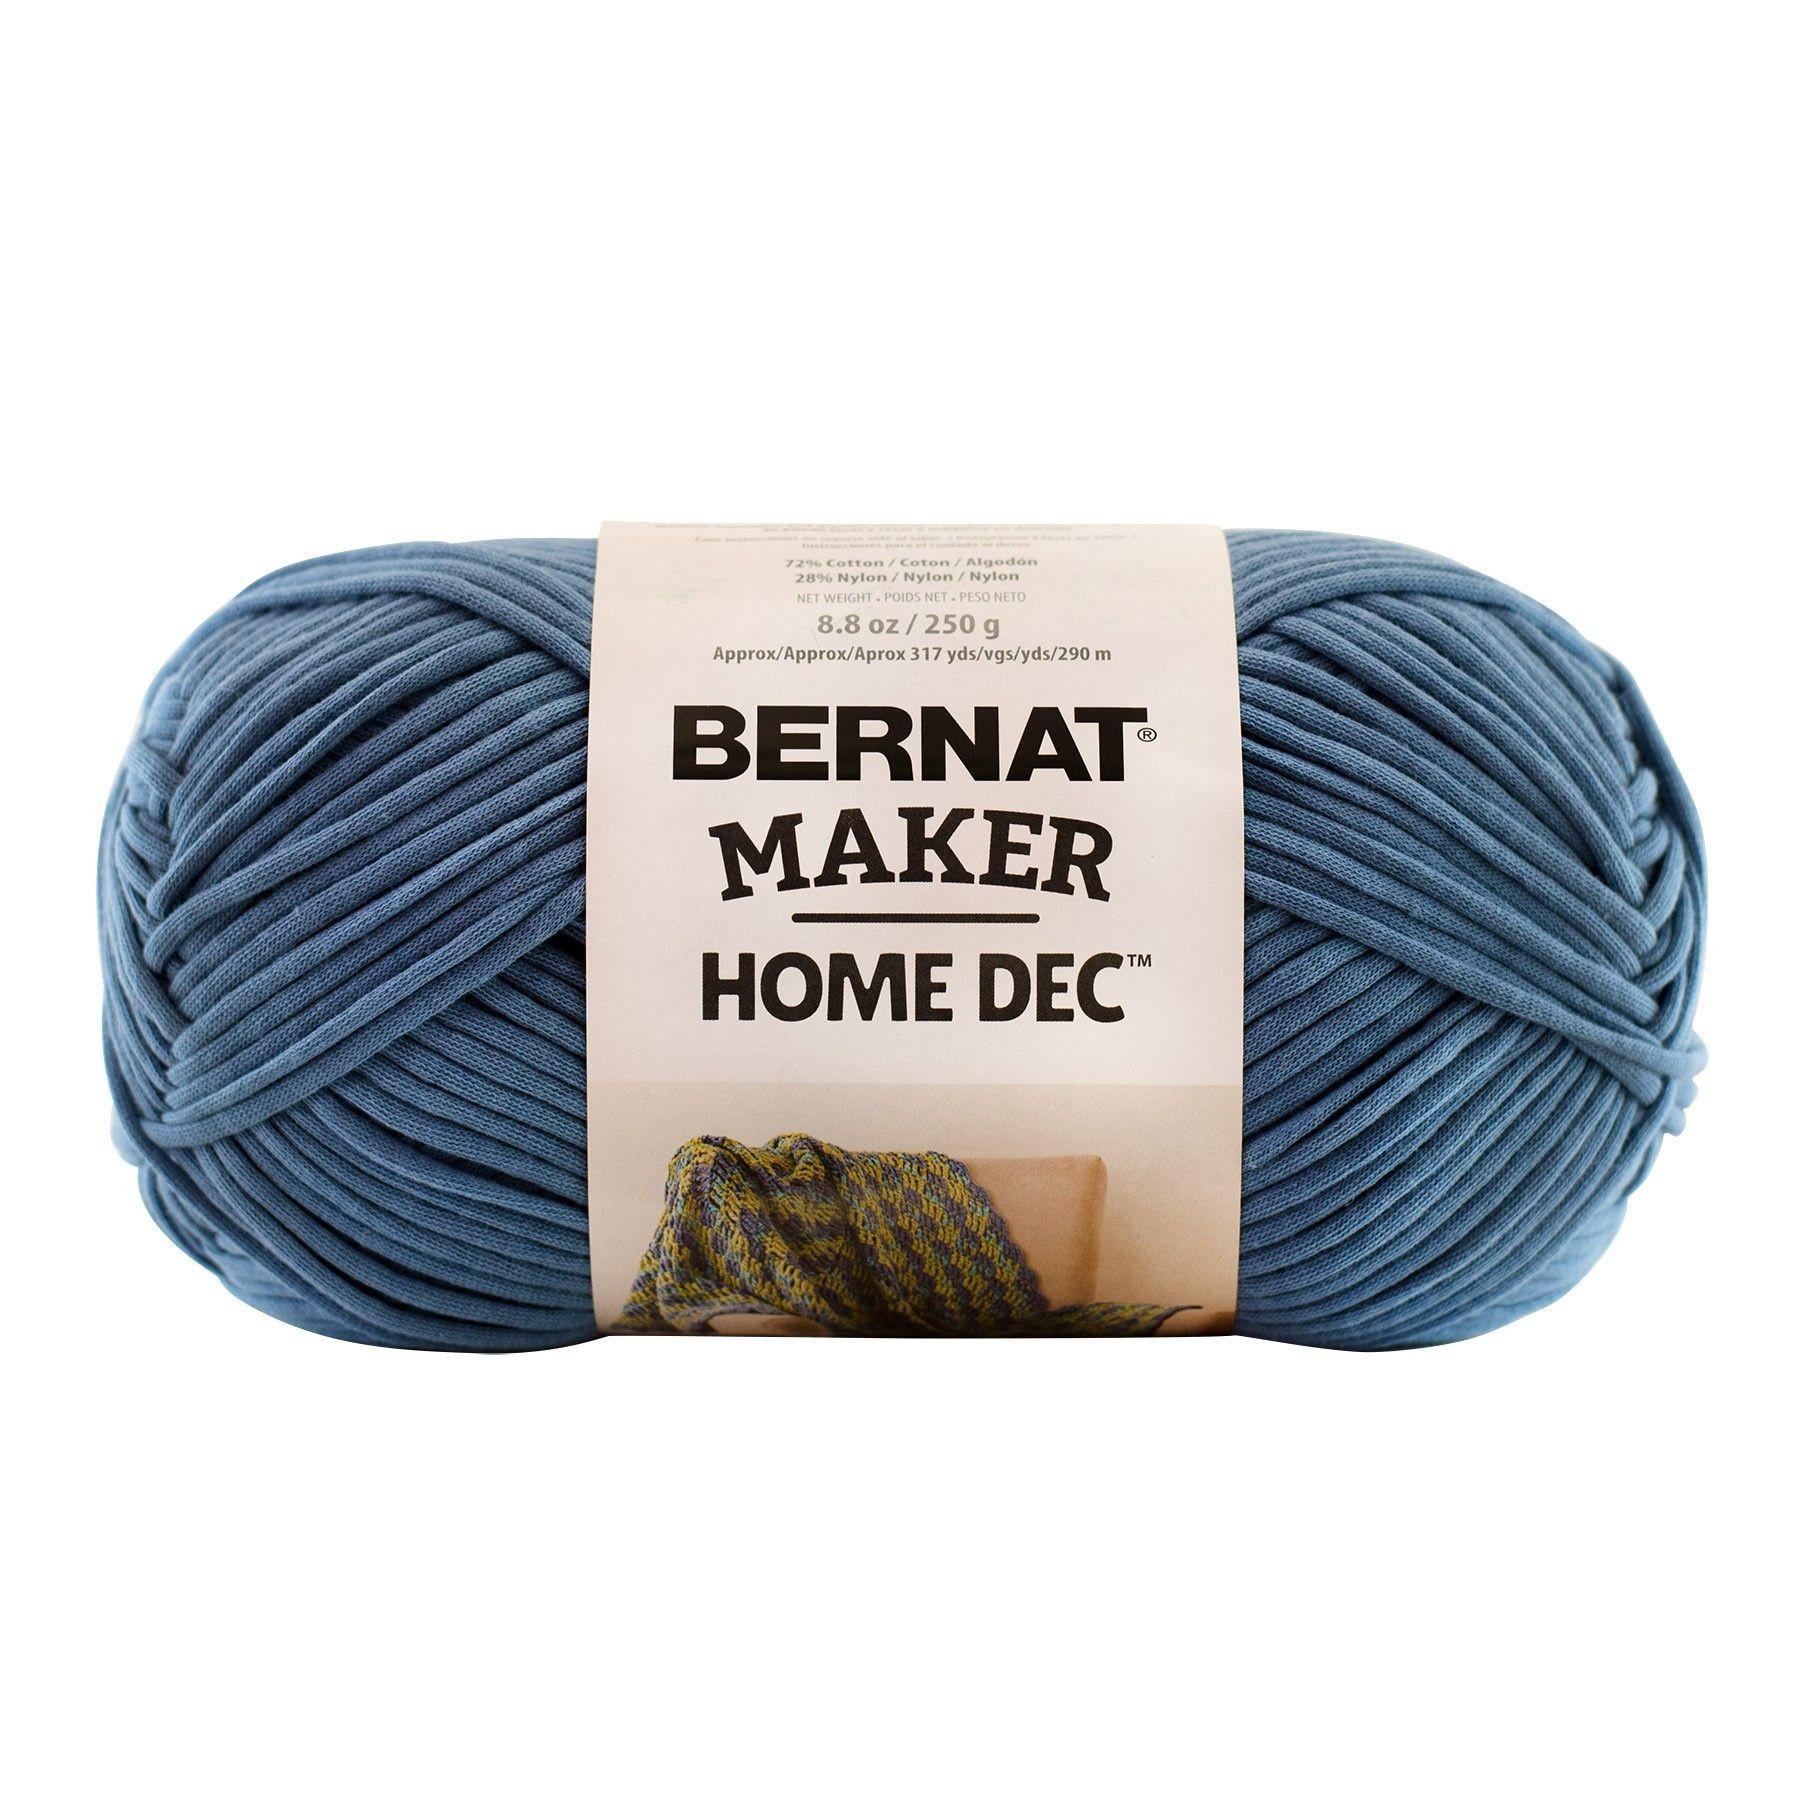 Bernat Maker Home Dec Yarn in Steel Blue | Blue home decor ...